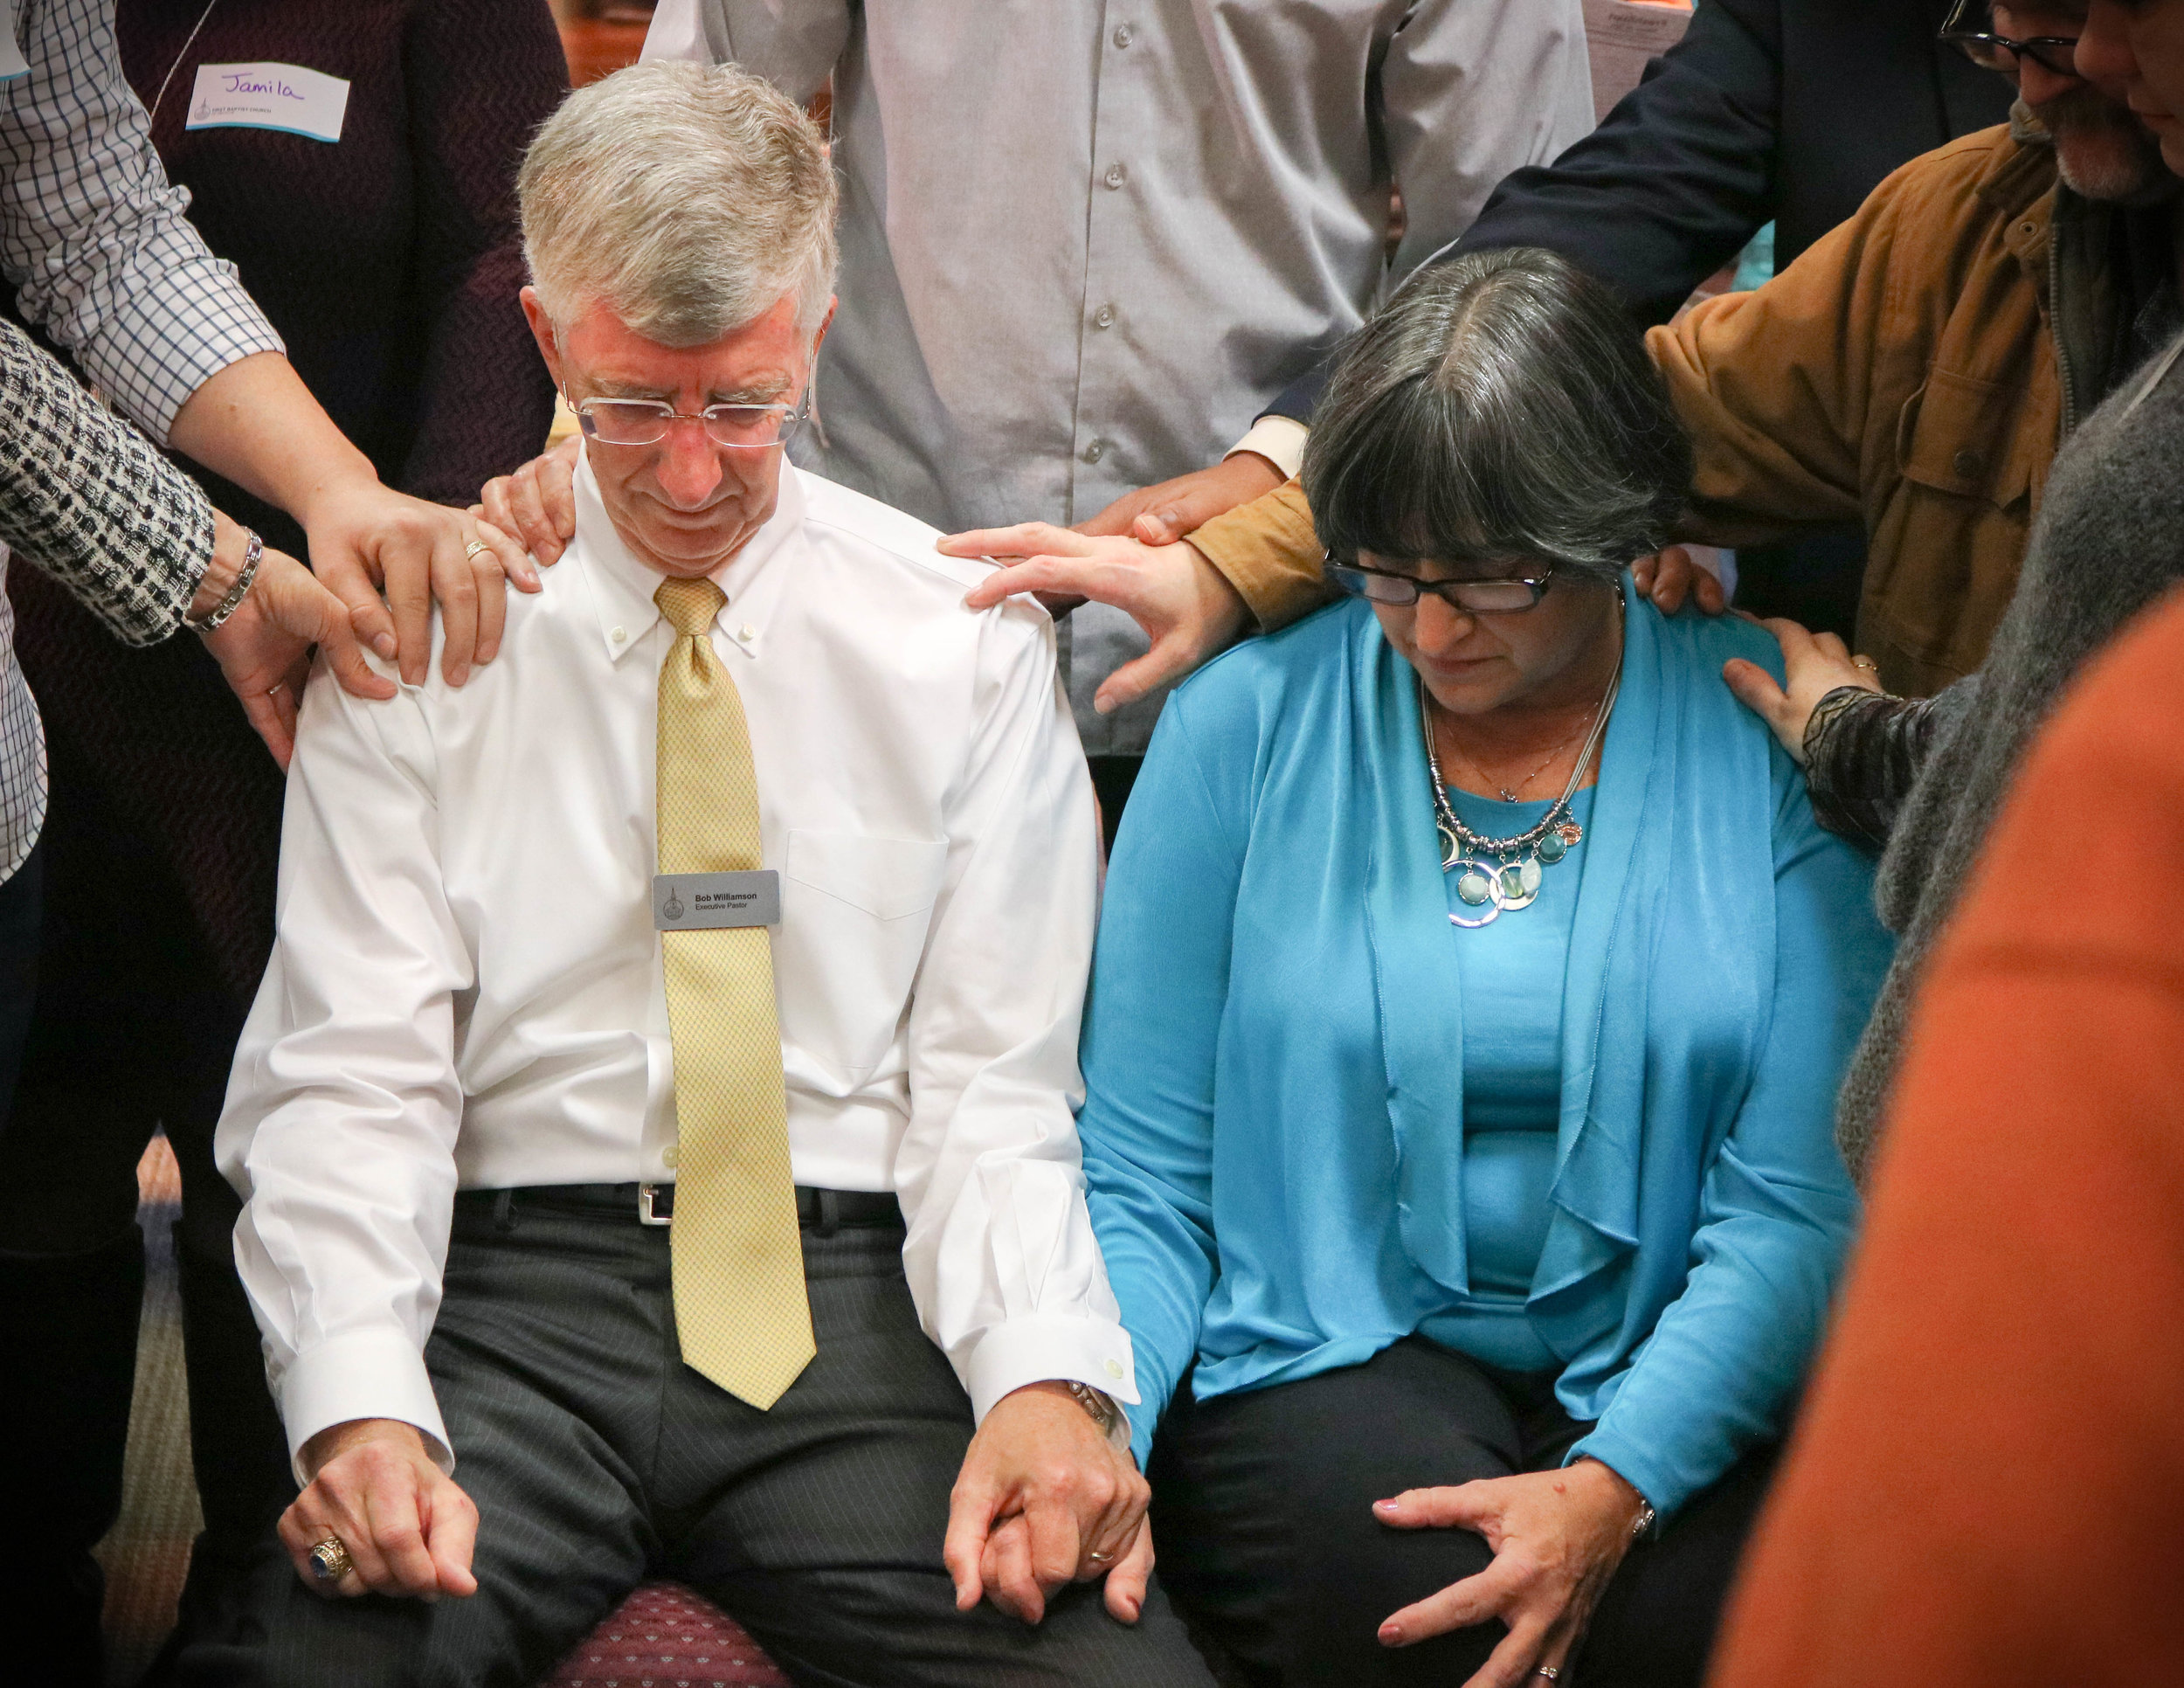 first-baptist-church-decatur-worship-bob-williamson-fresh-start-prayer2.jpg